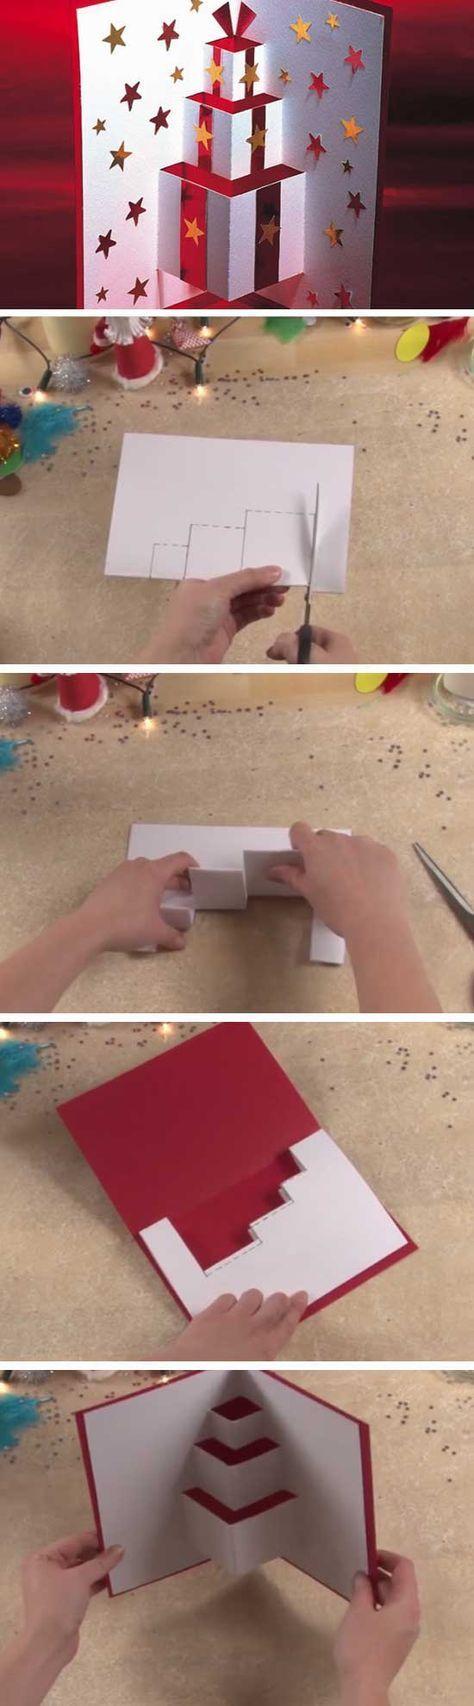 Pop-up Present | 20 + DIY Christmas Cards for Kids to Make